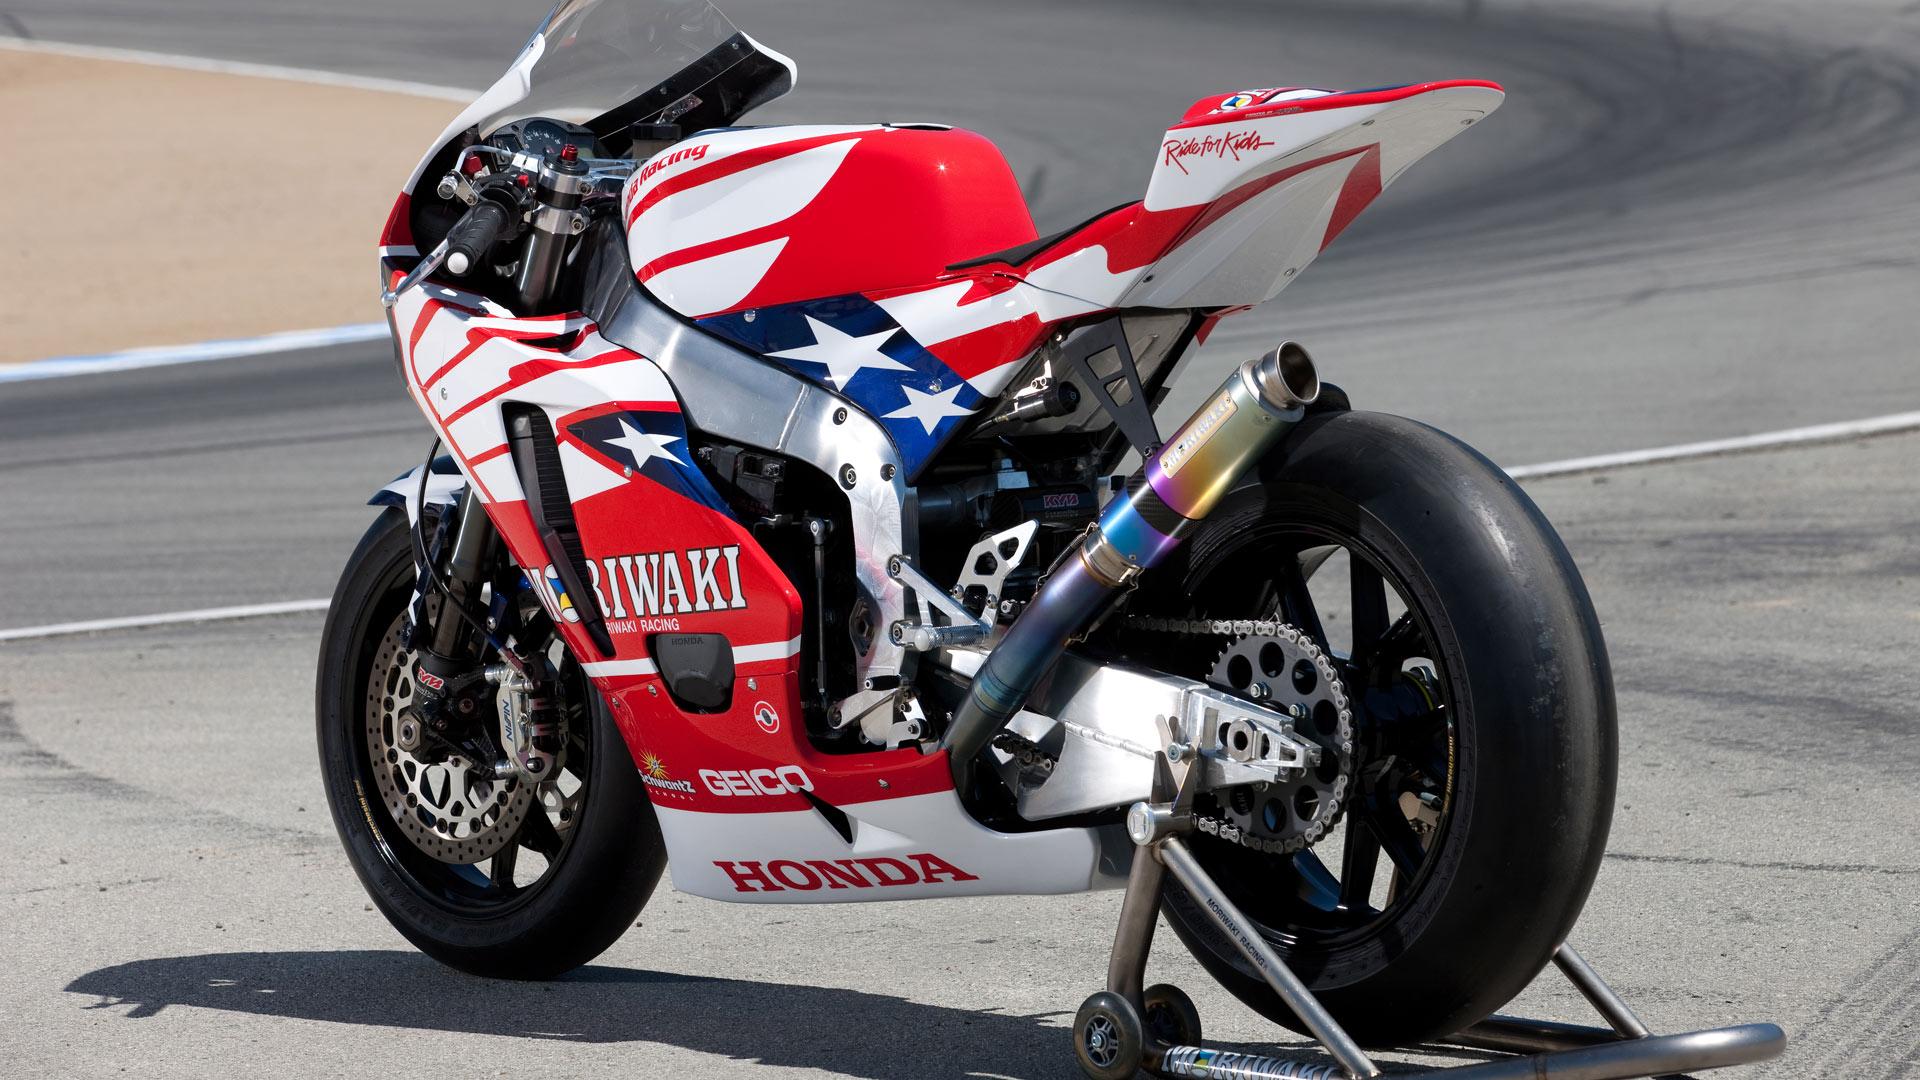 Moto GP Honda Bike USA Flag Paint 1920x1080 HD MotoGP 1920x1080